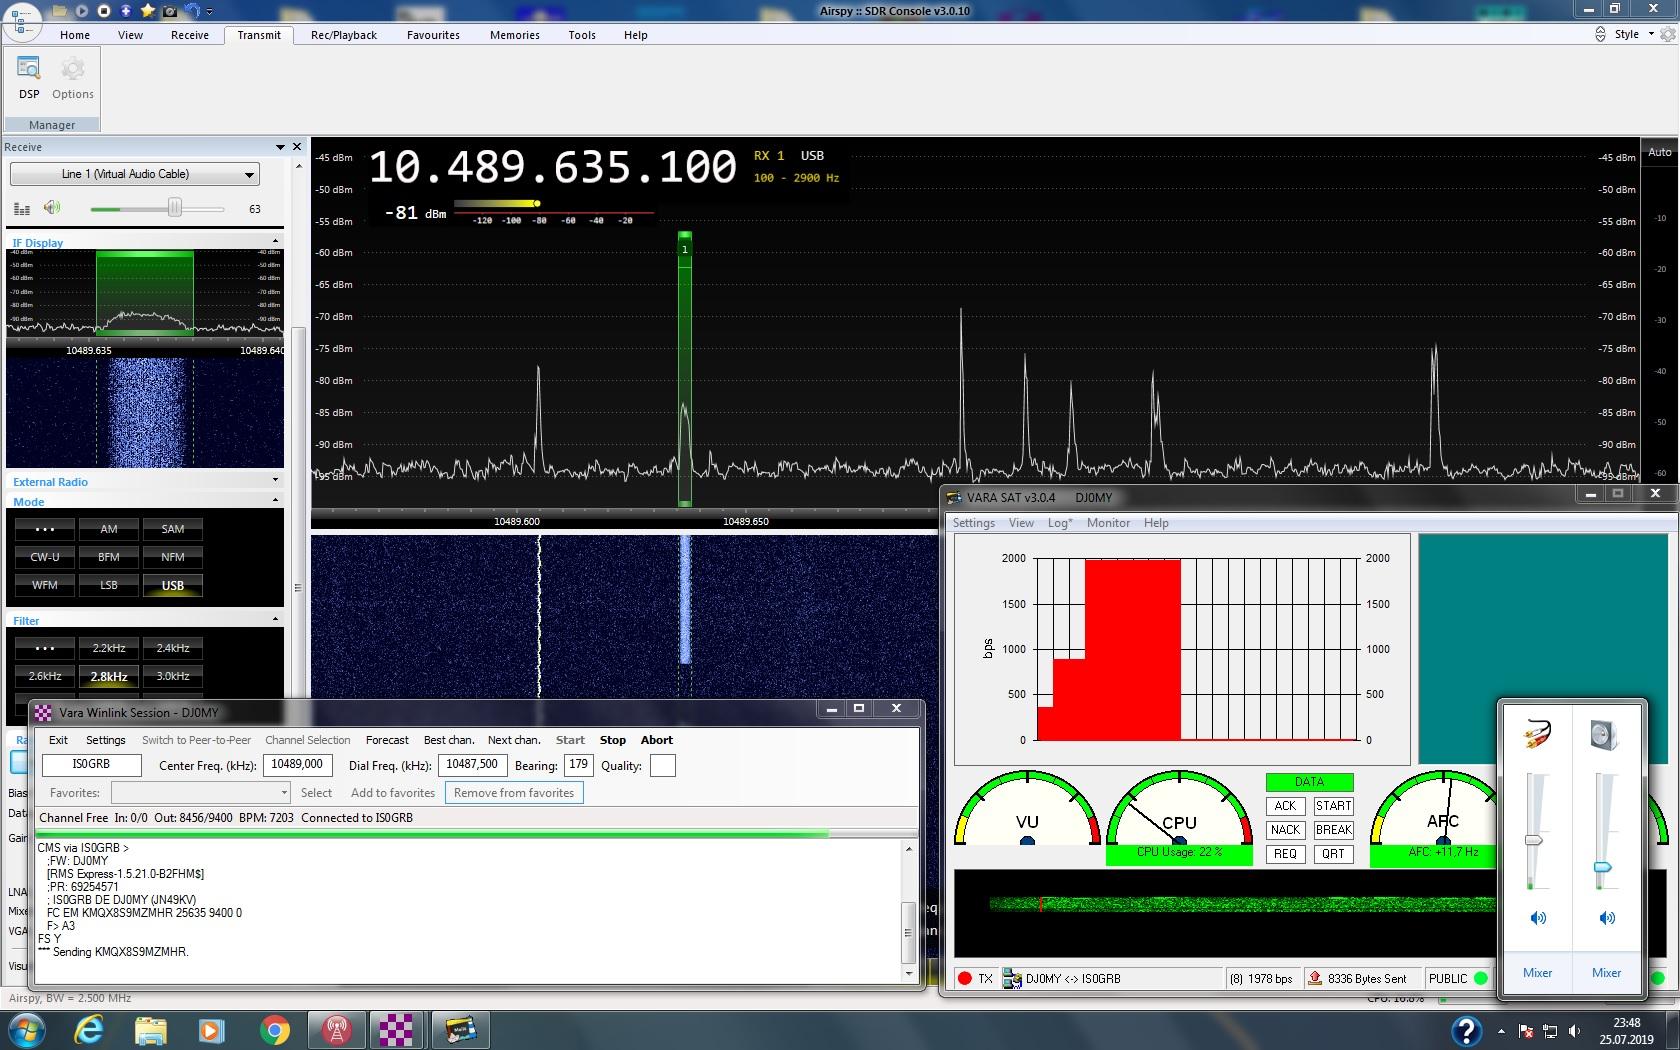 IS0GRB Winlink Server on QO-100 (Dial 10489635 0 USB) - Seite 3